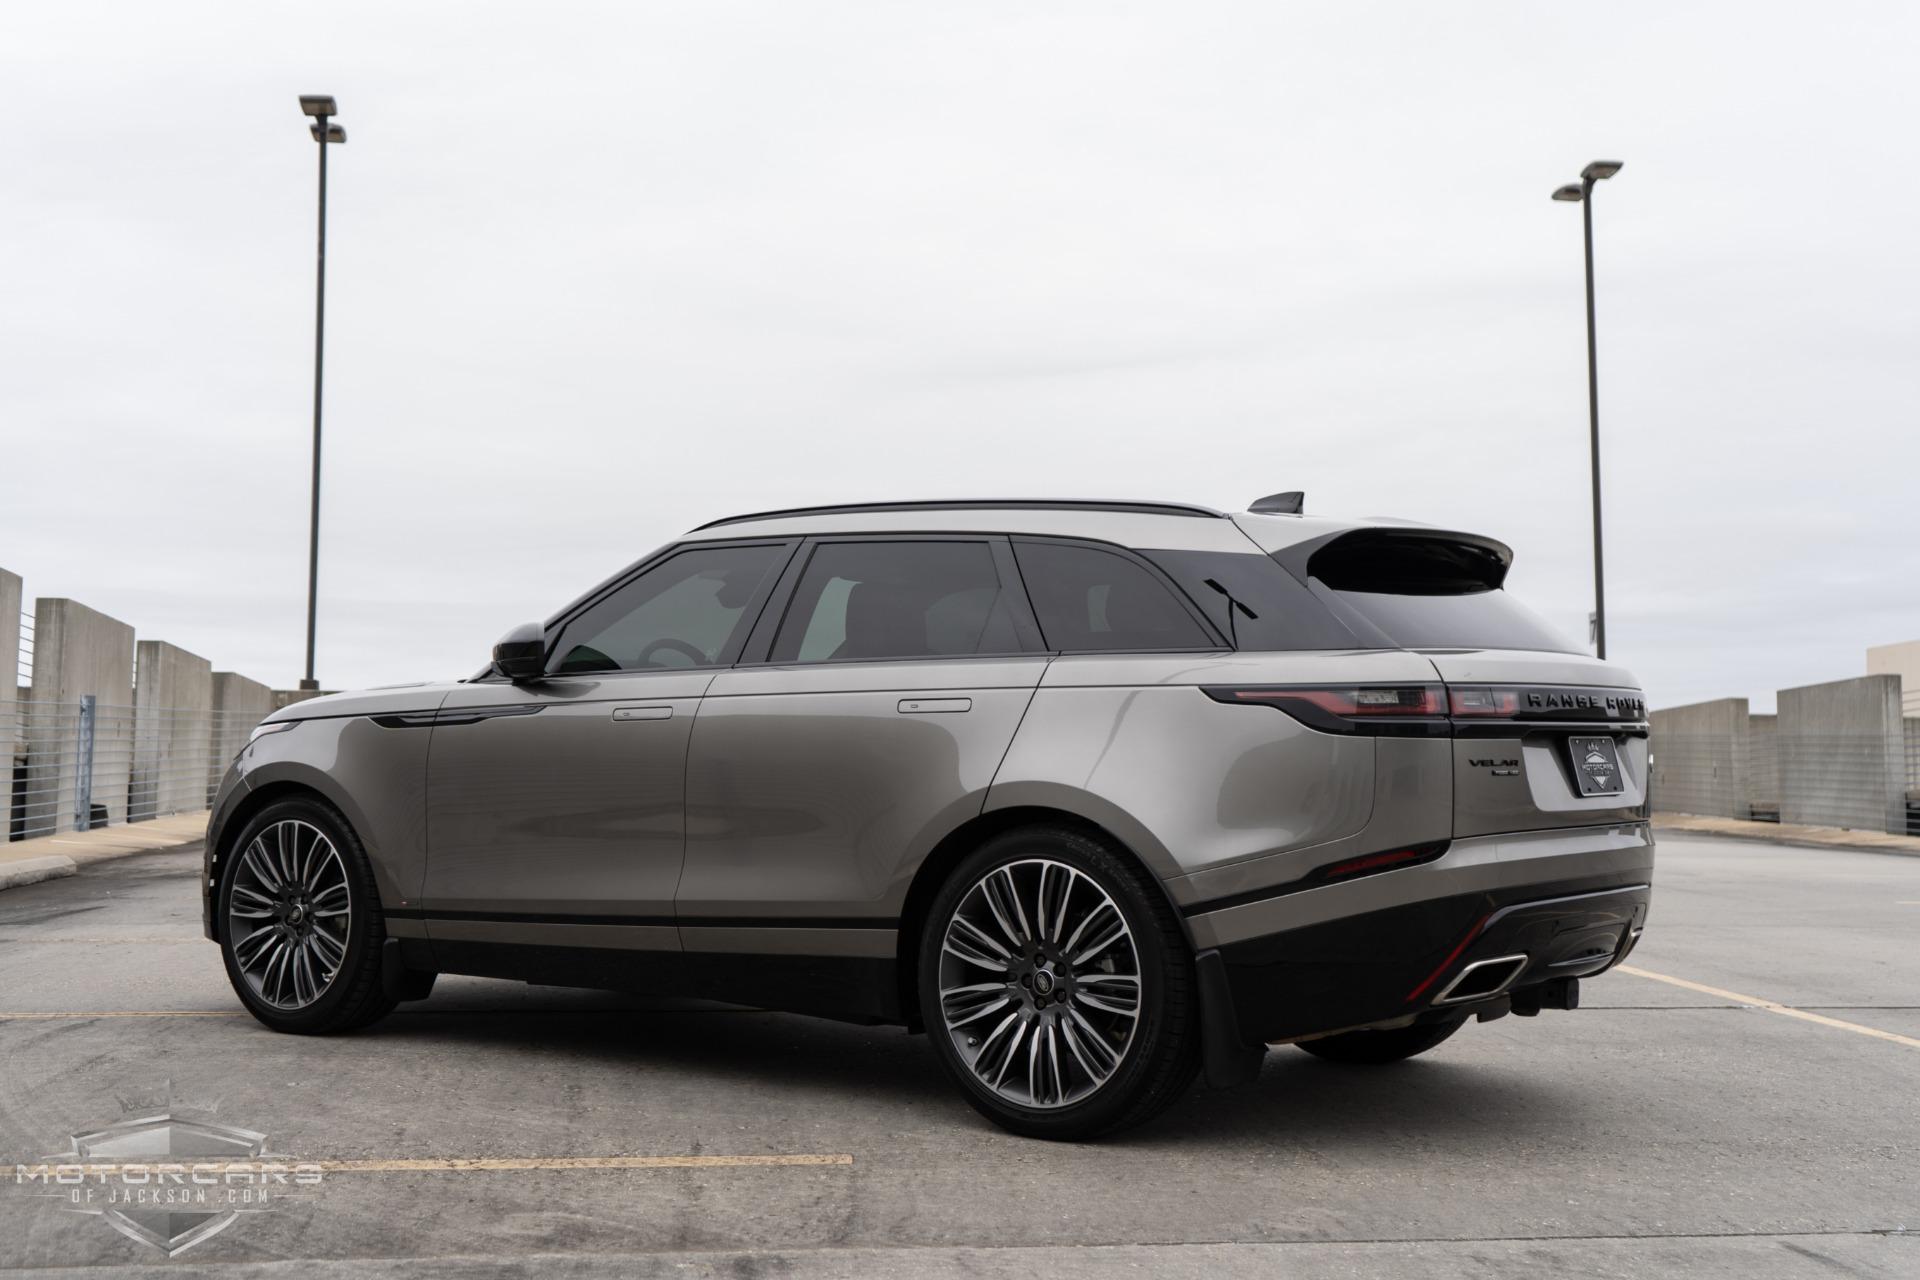 Used-2019-Land-Rover-Range-Rover-Velar-R-Dynamic-HSE-for-sale-Jackson-MS